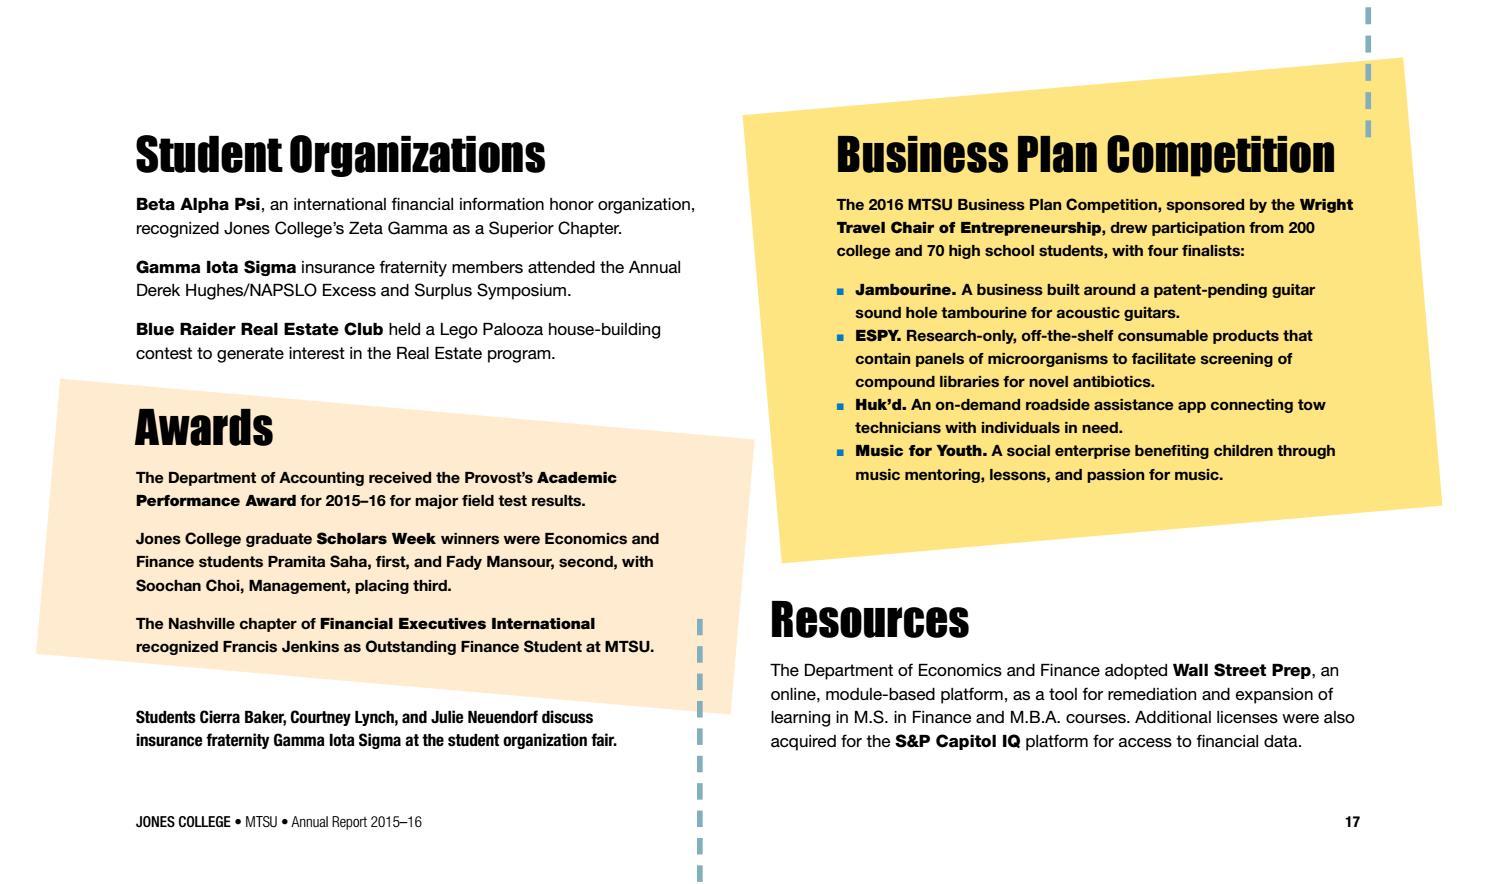 Jones College of Business MTSU by MTSU Business and Economic